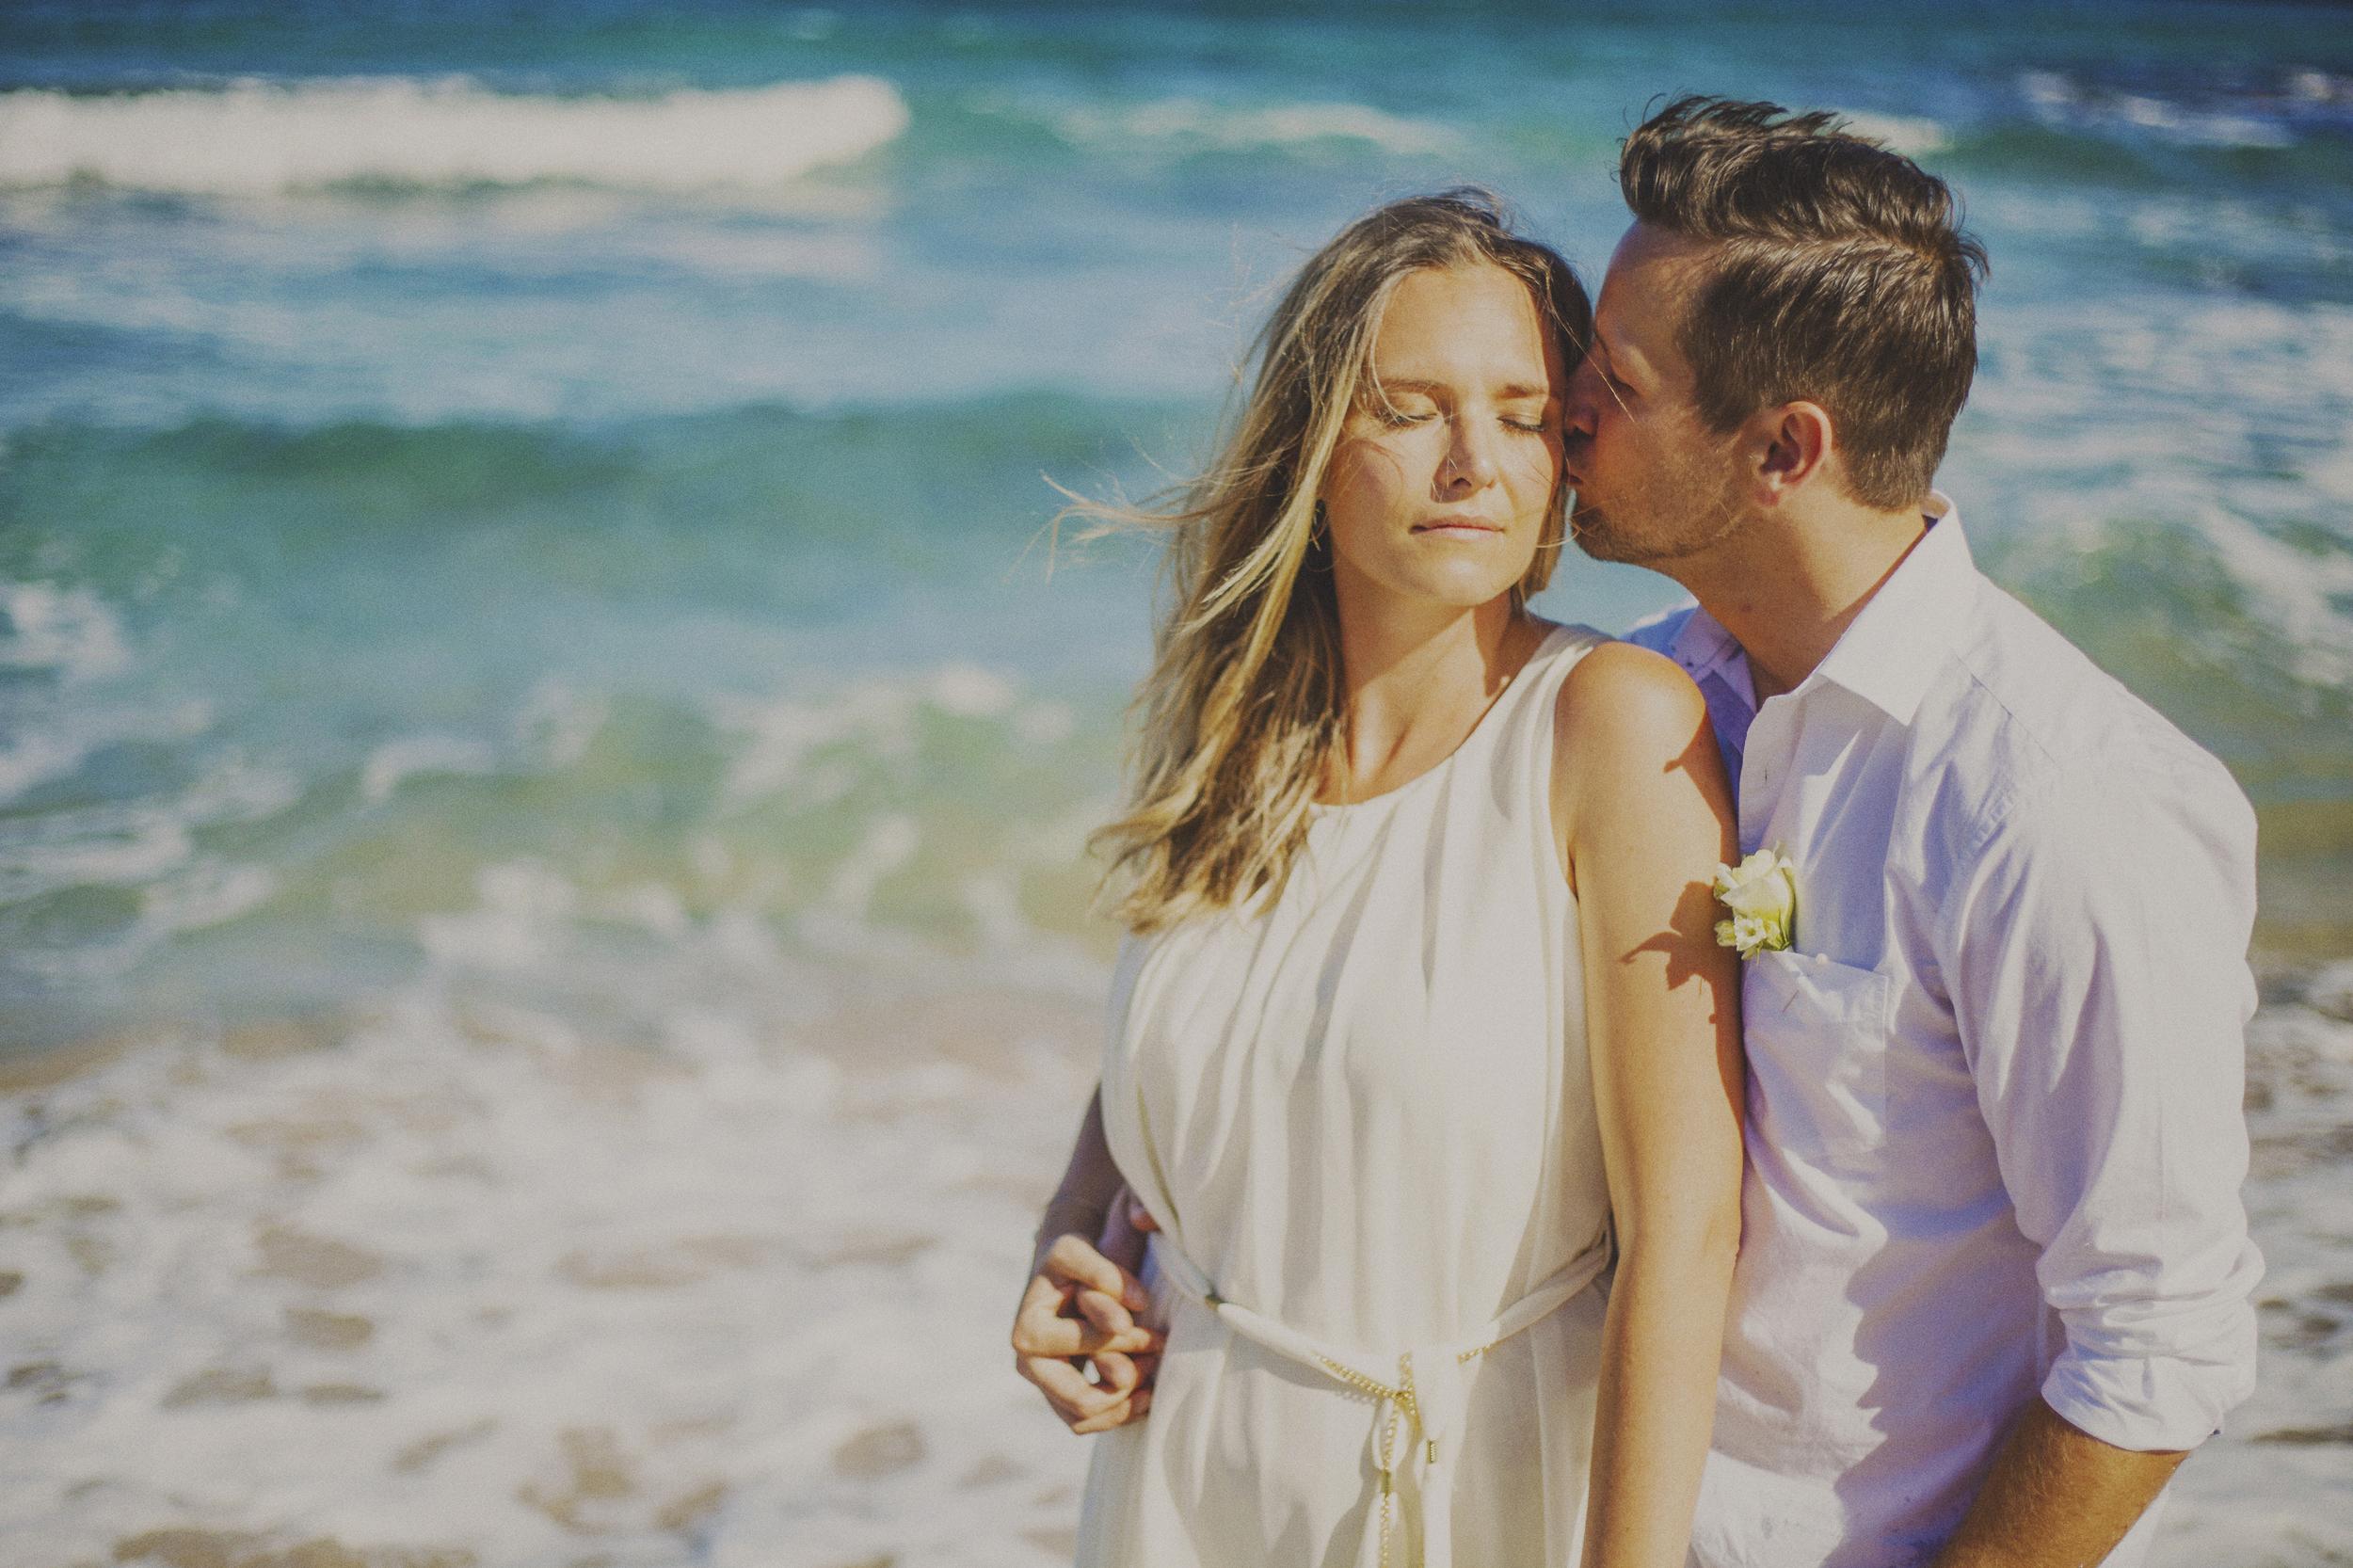 angie-diaz-photography-maui-elopement-oneloa-ironwoods-beach-25.jpg